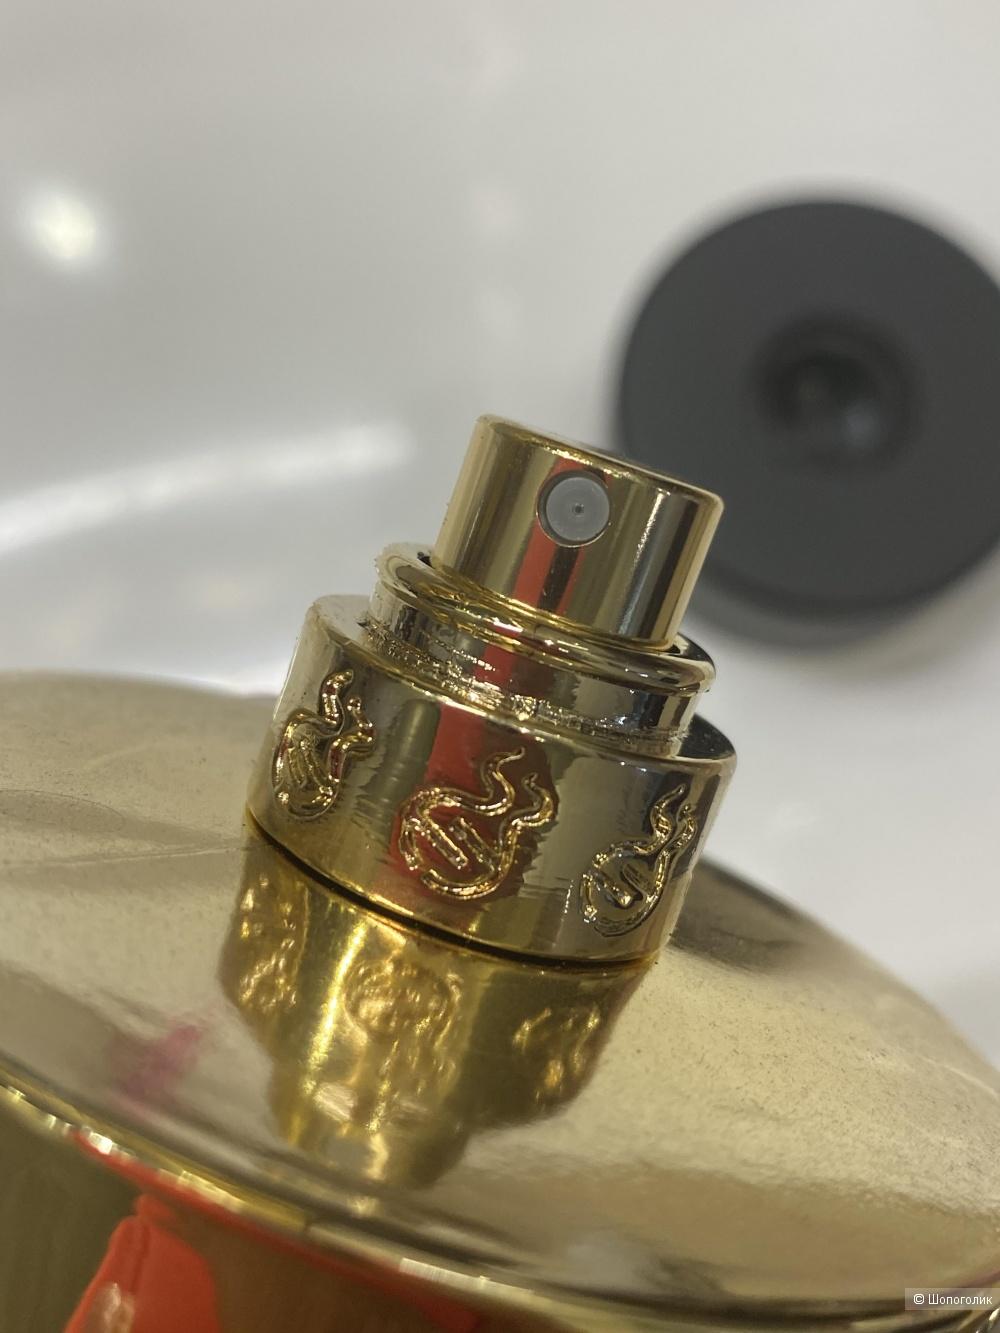 Рарфюм Tiziano Terenzi Gold Rose Oudh, 100 ml.